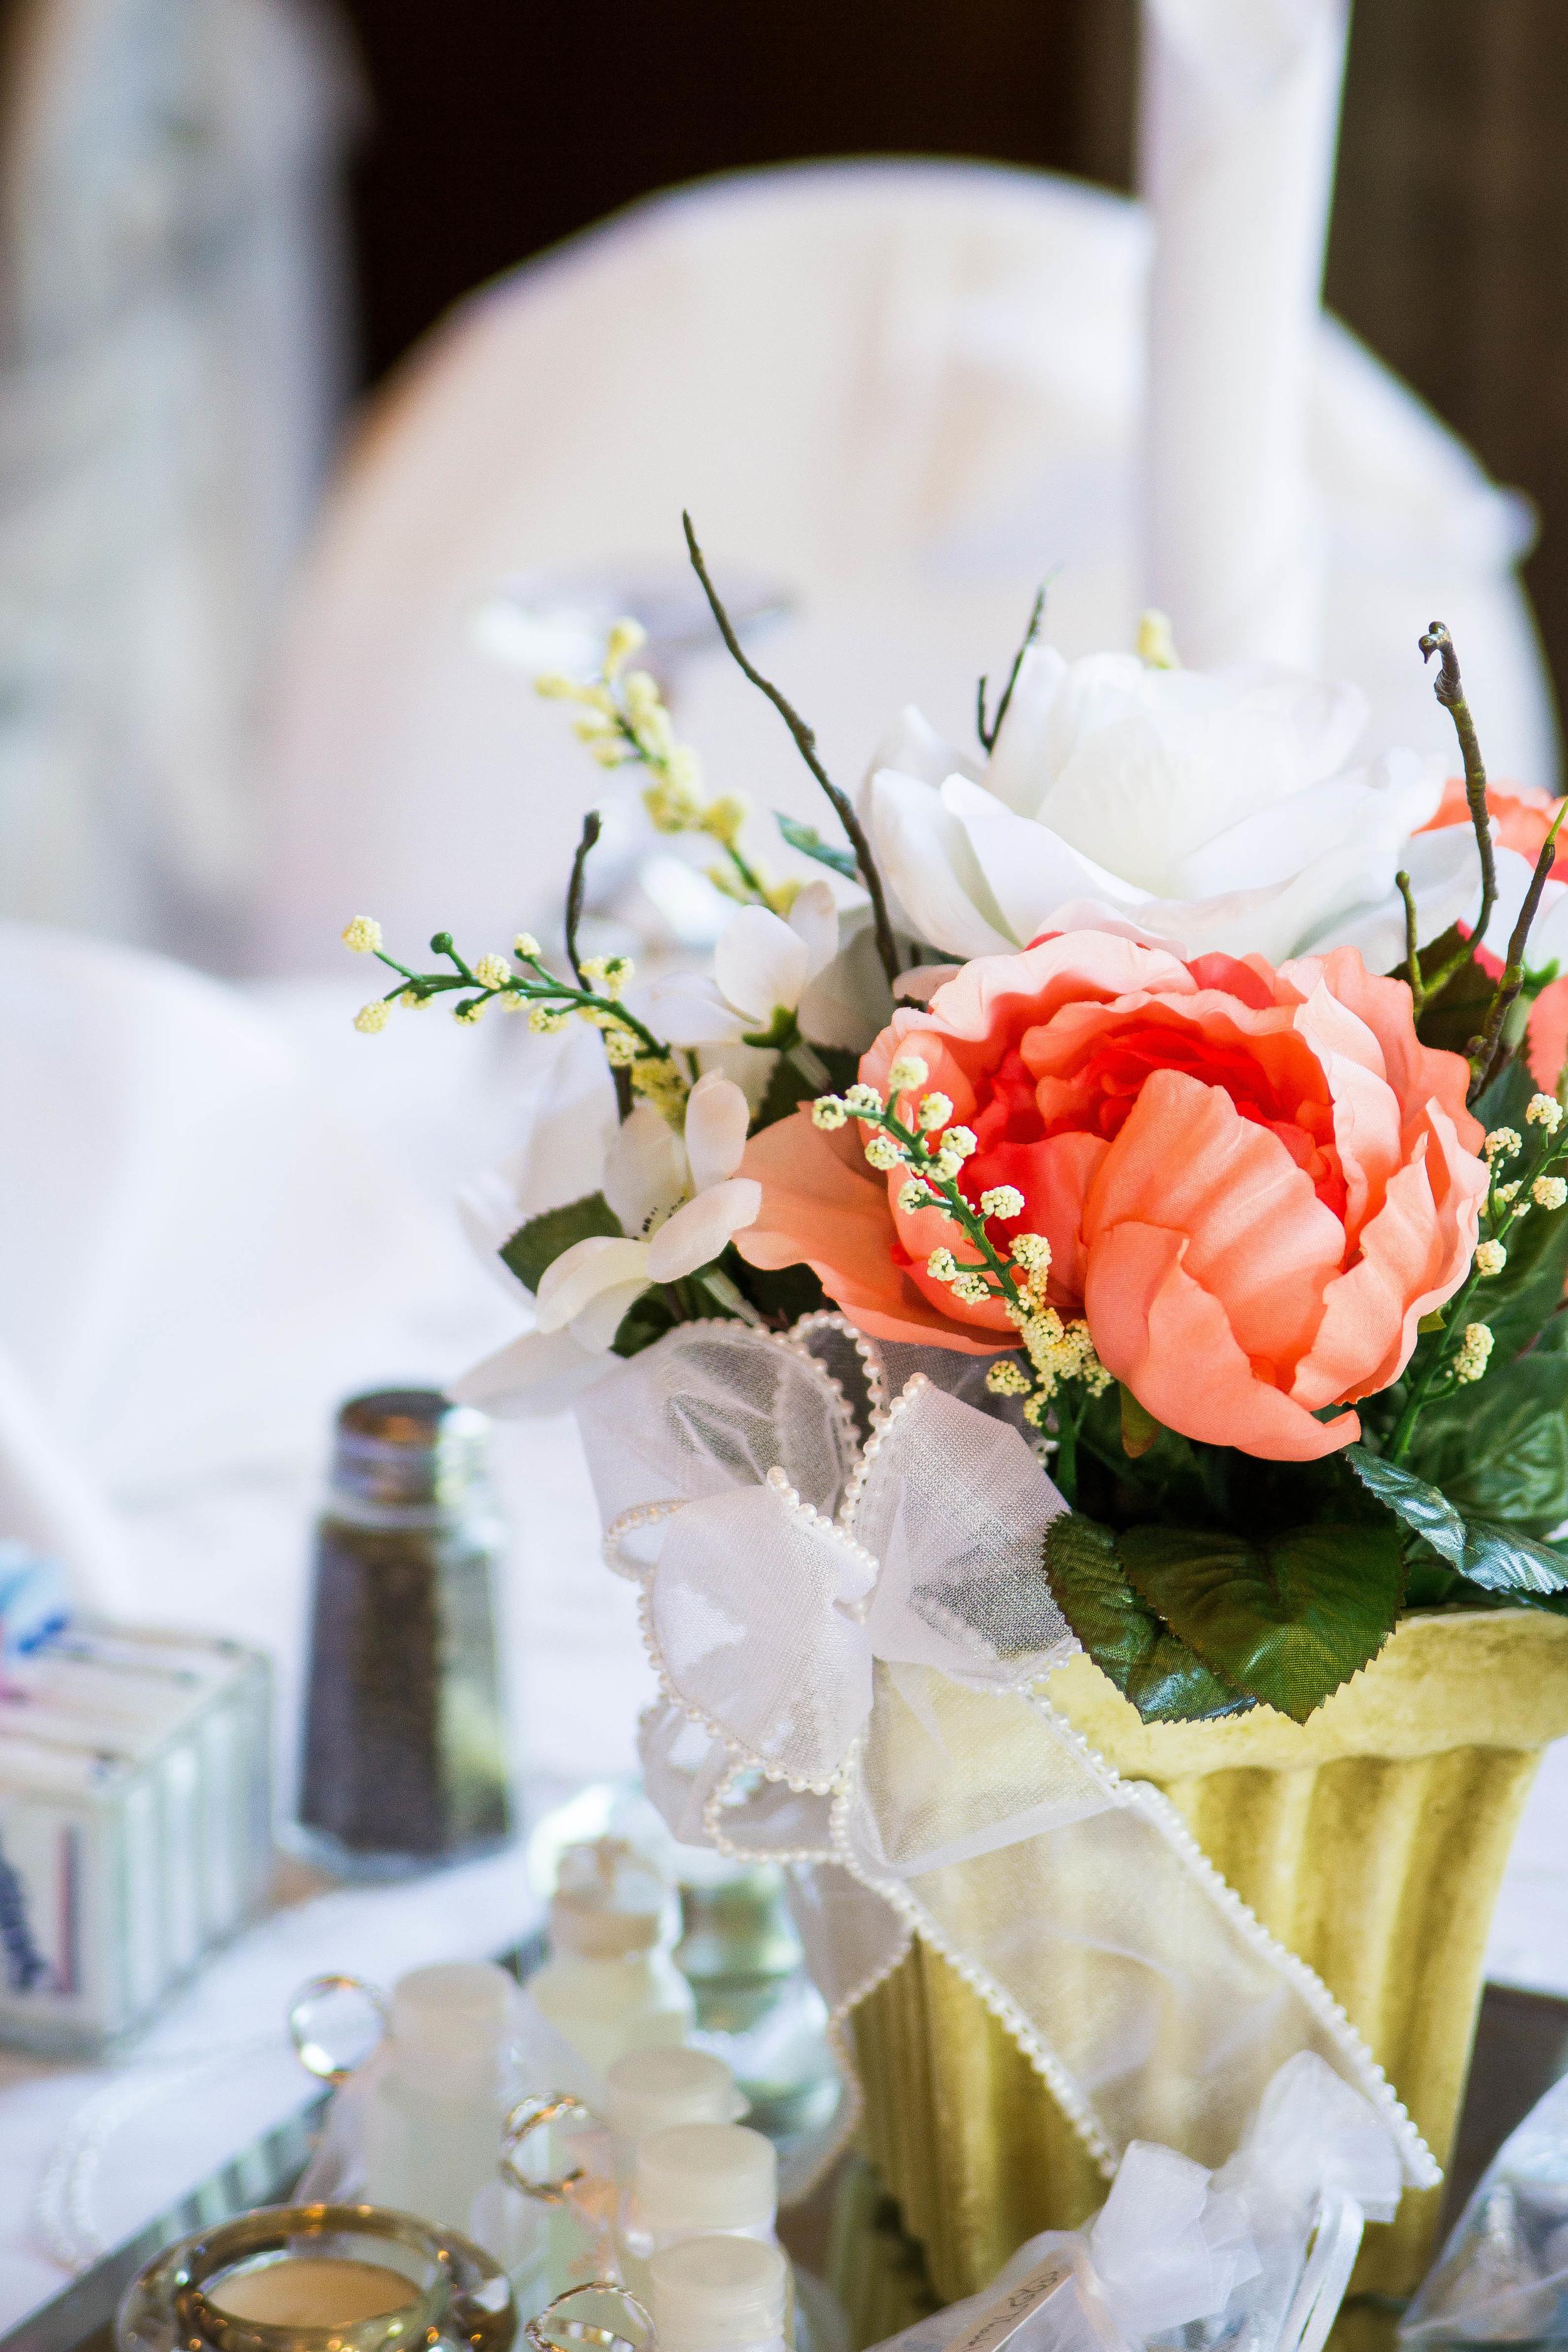 Centerpieces from an Indoor Ballroom Wedding in Orlando